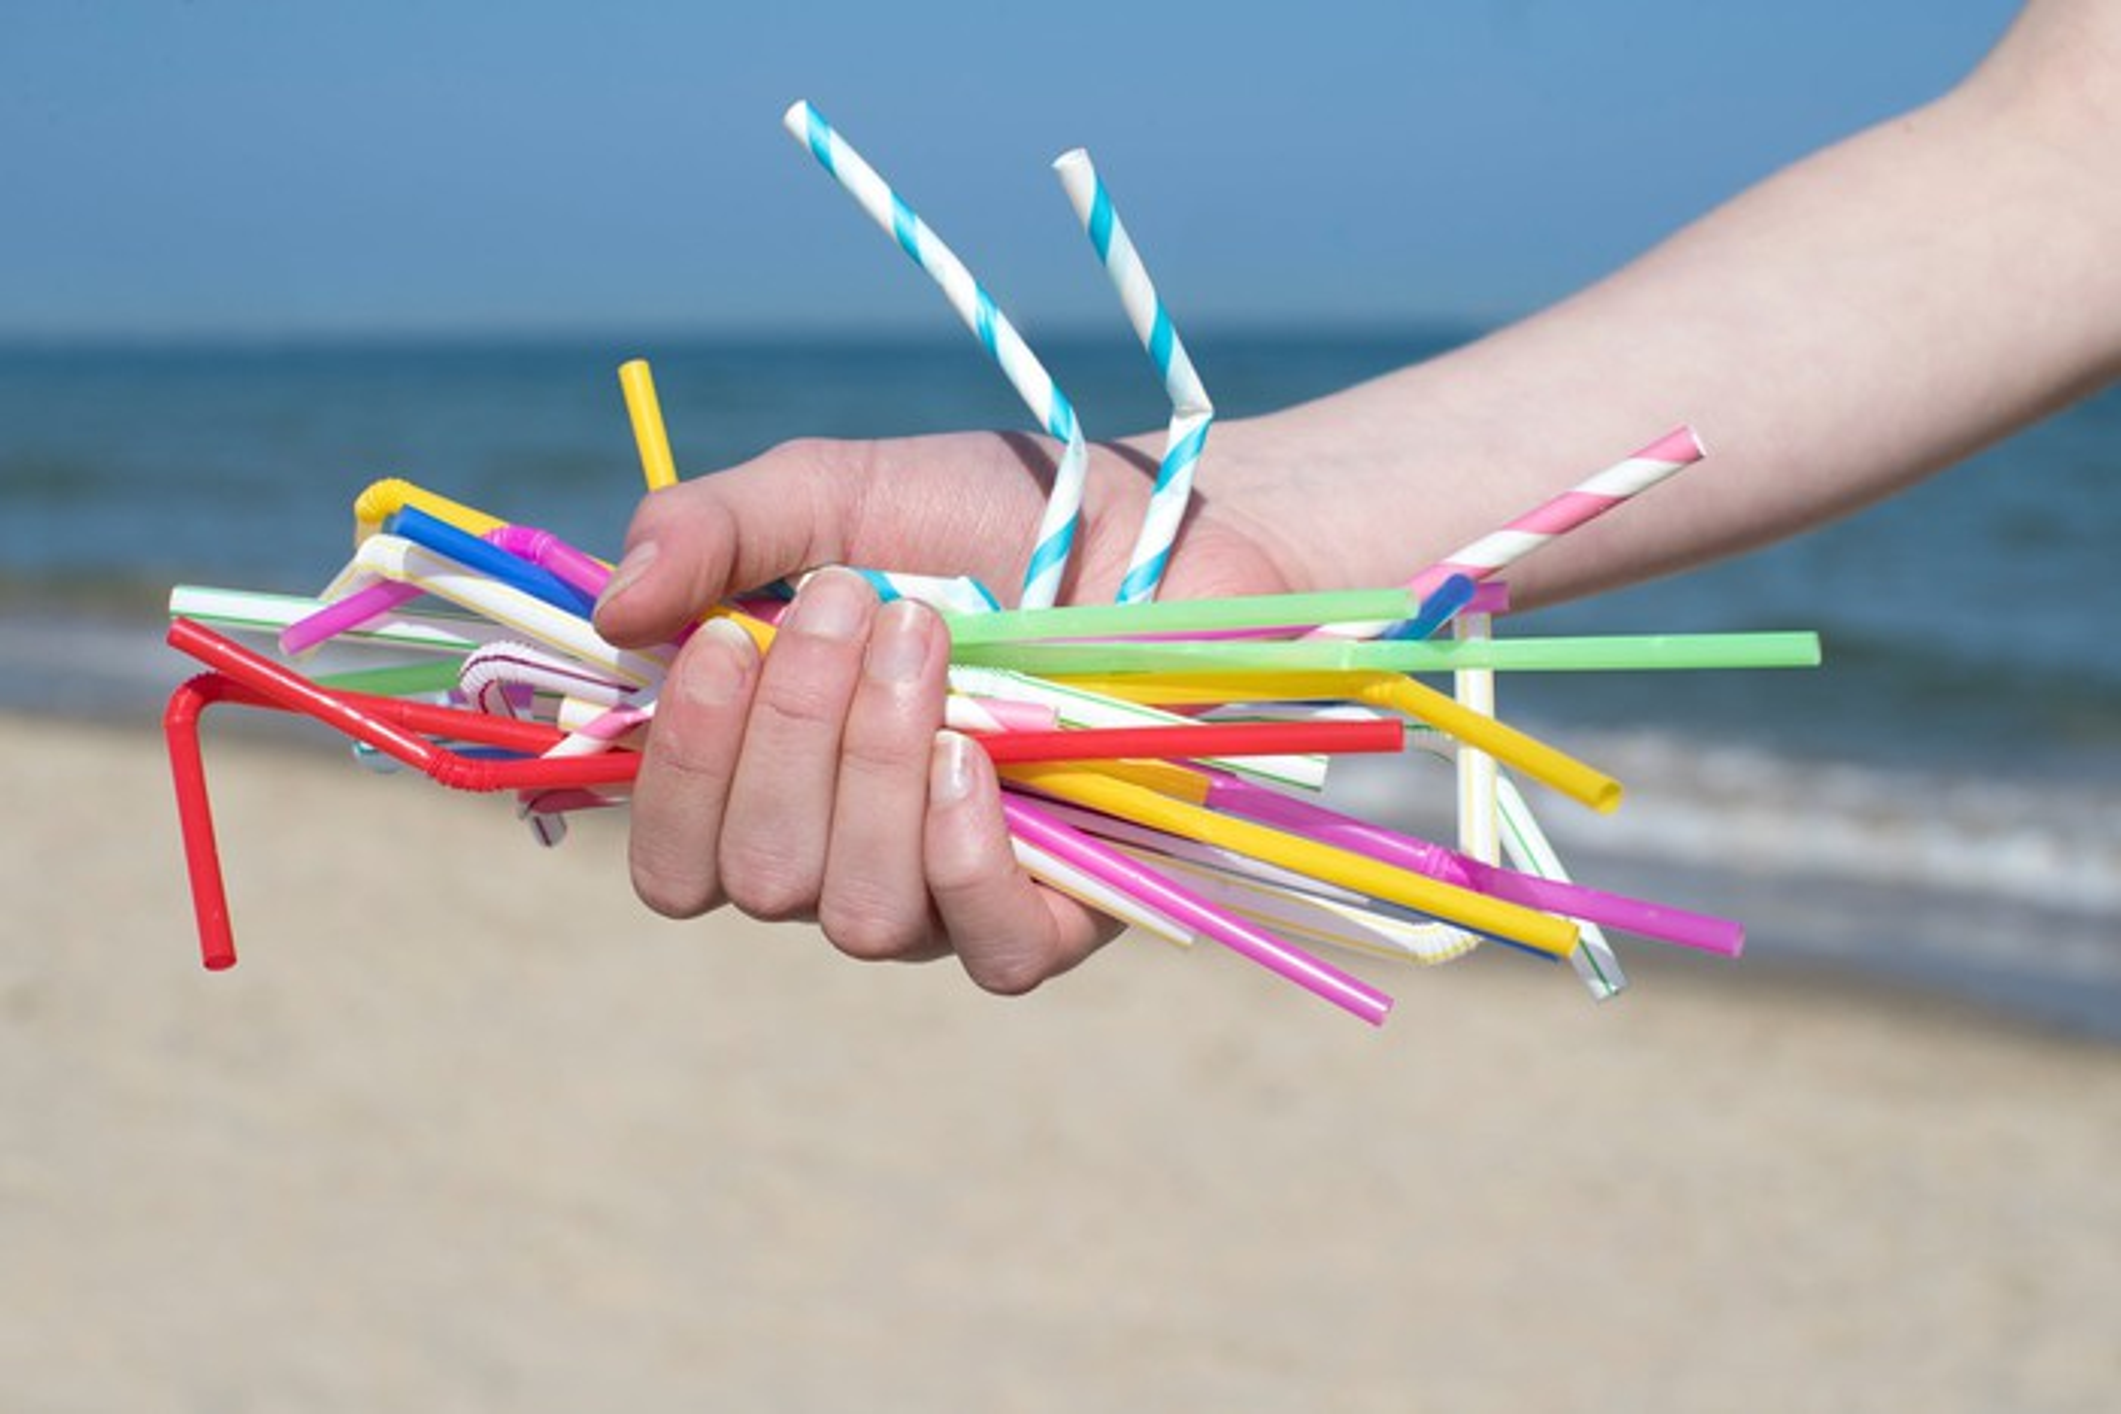 Hand holding plastic straws at beach